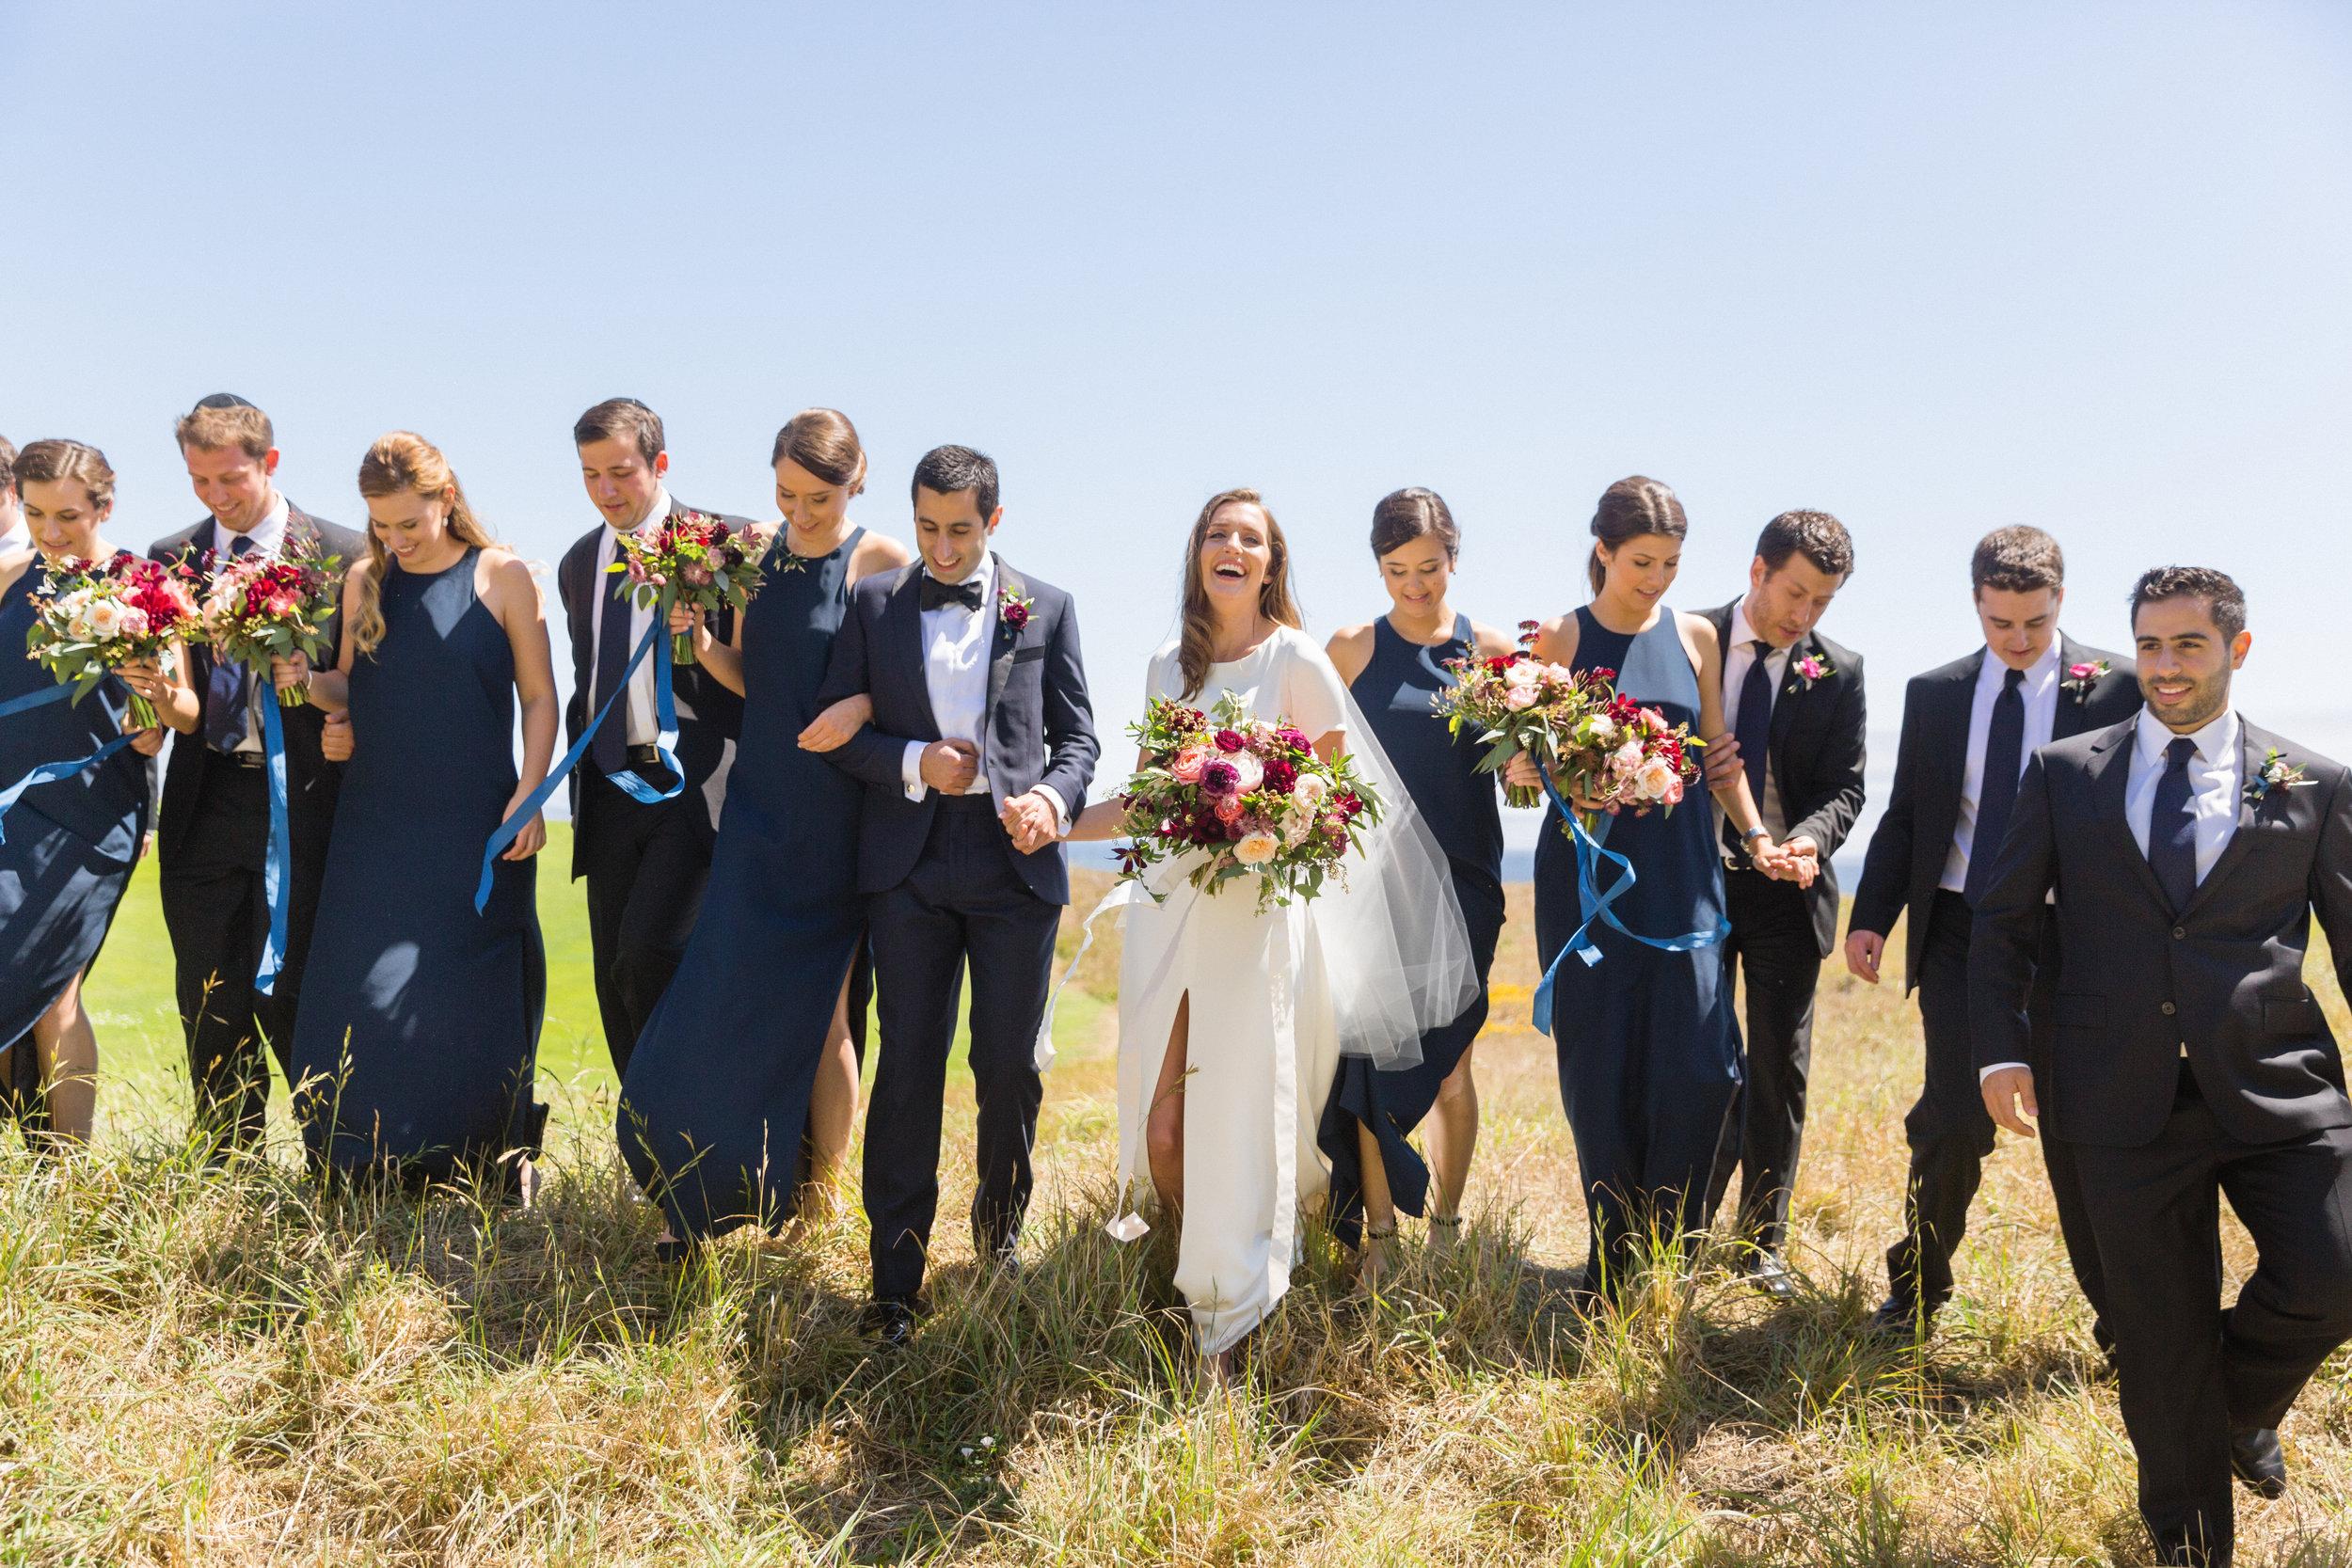 larissa-cleveland-sivanjeremy-wedding-0285-2.jpg